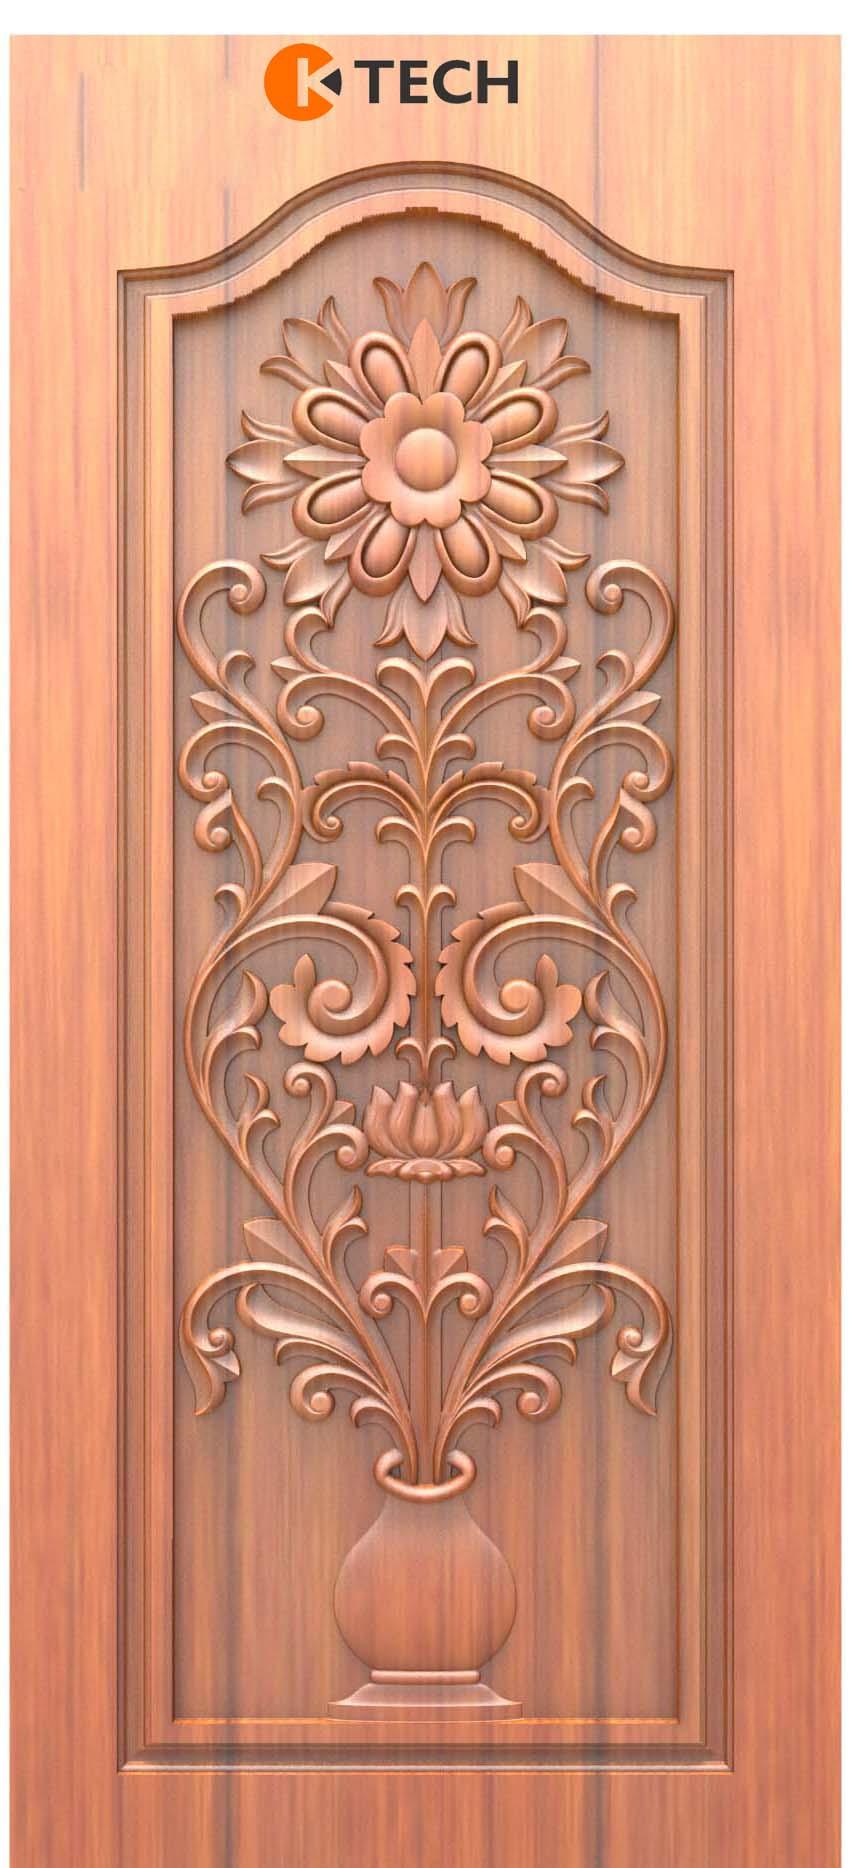 K-TECH CNC Doors Design 172